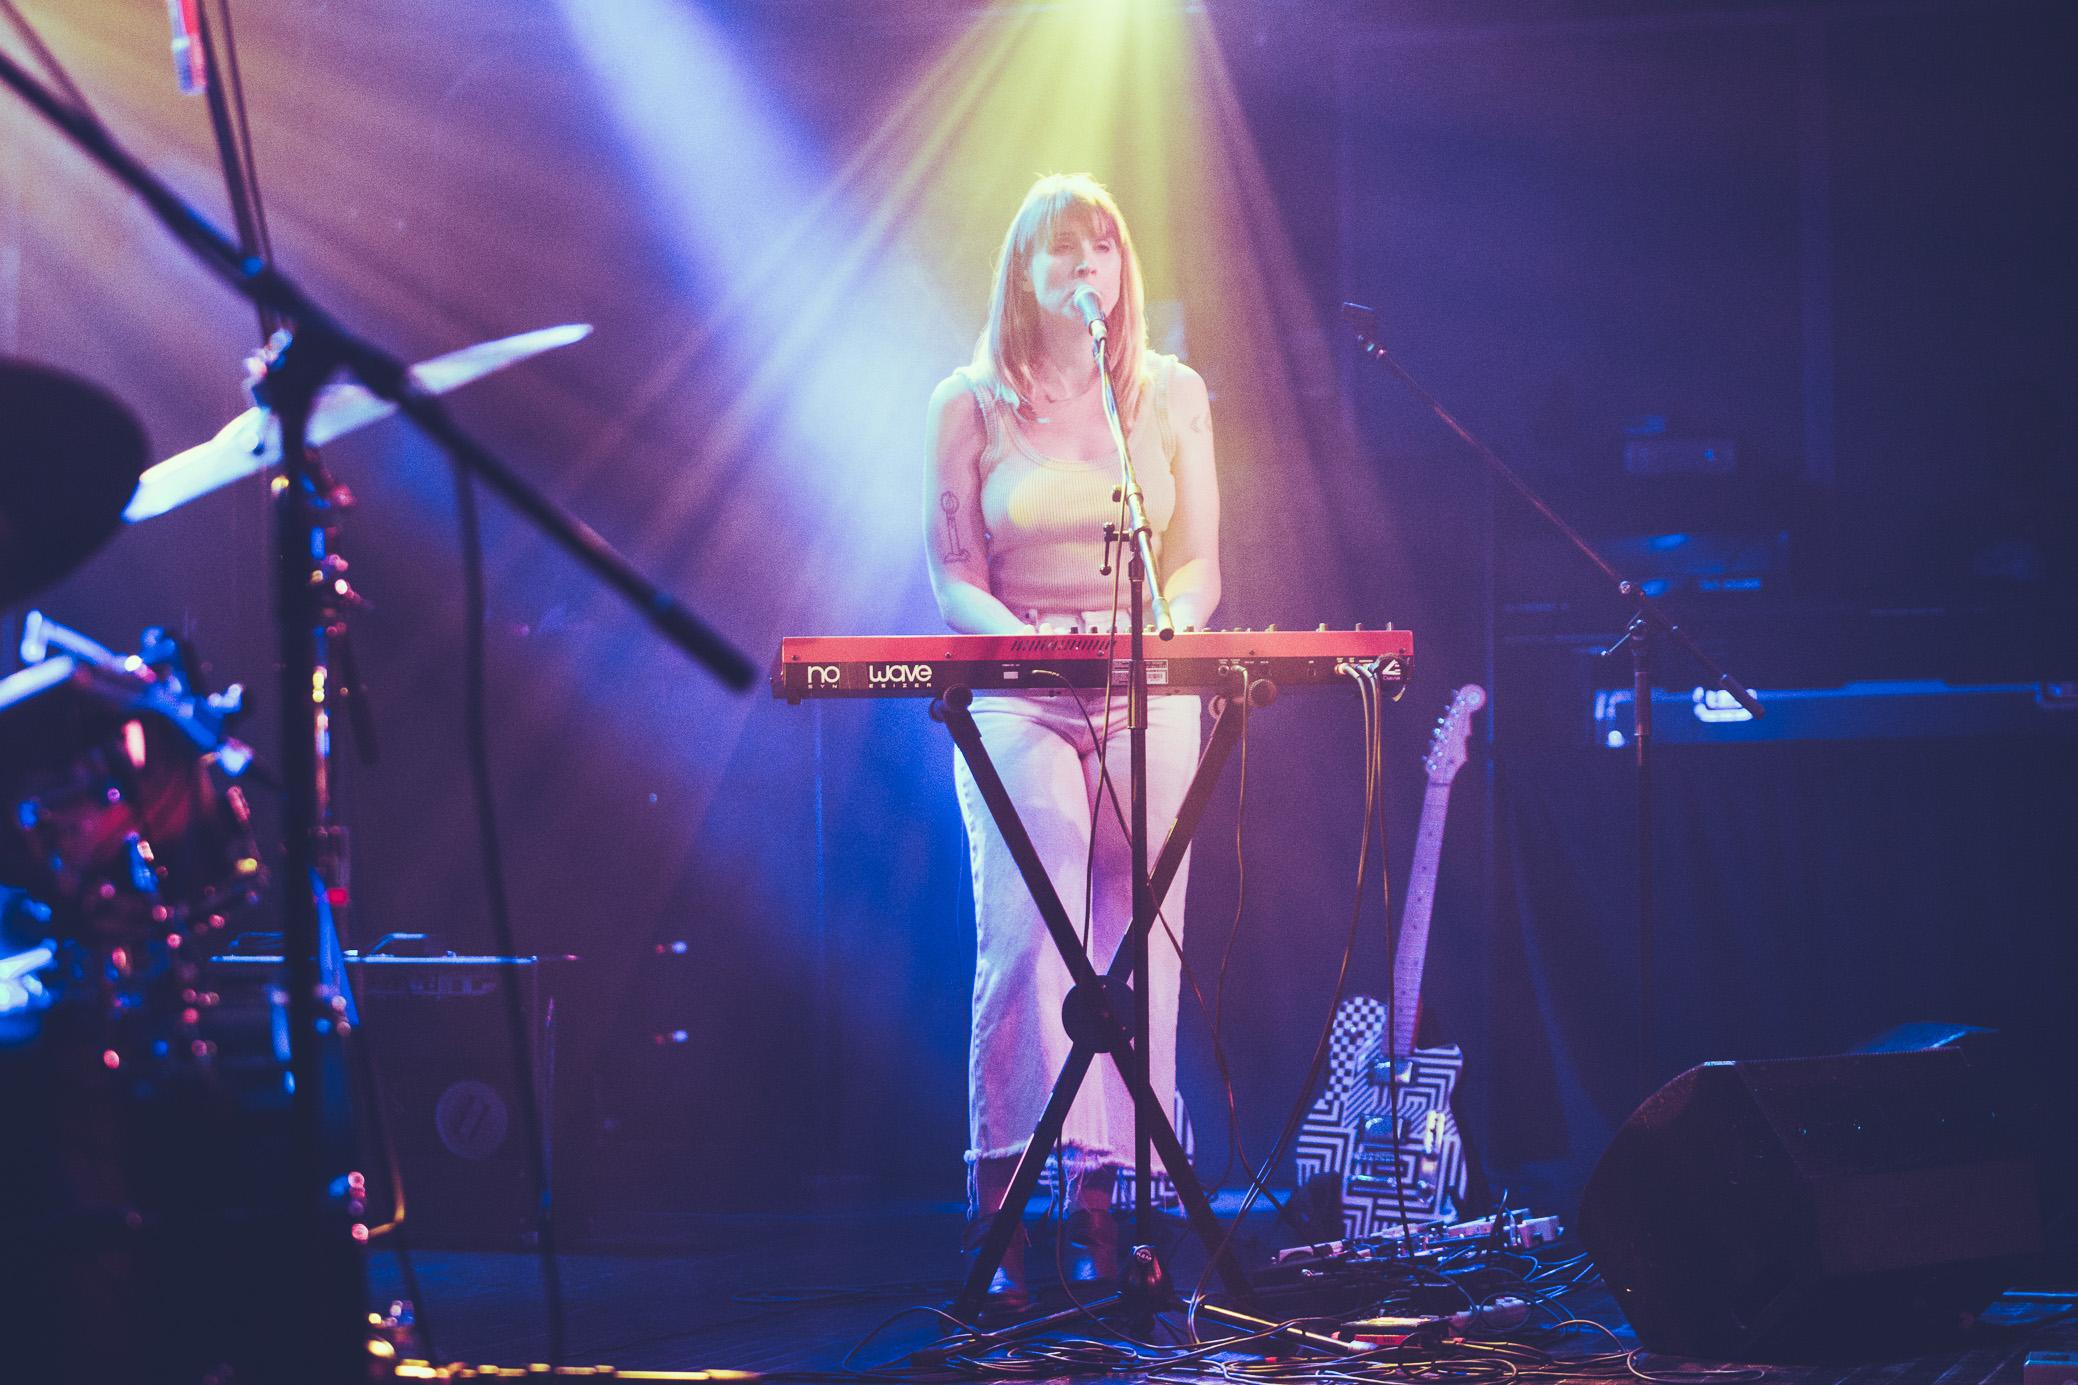 Wye Oak performs in concert at Saturn Birmingham in Birmingham, Alabama on July 28th, 2018. (Photo by David A. Smith/DSmithScenes)